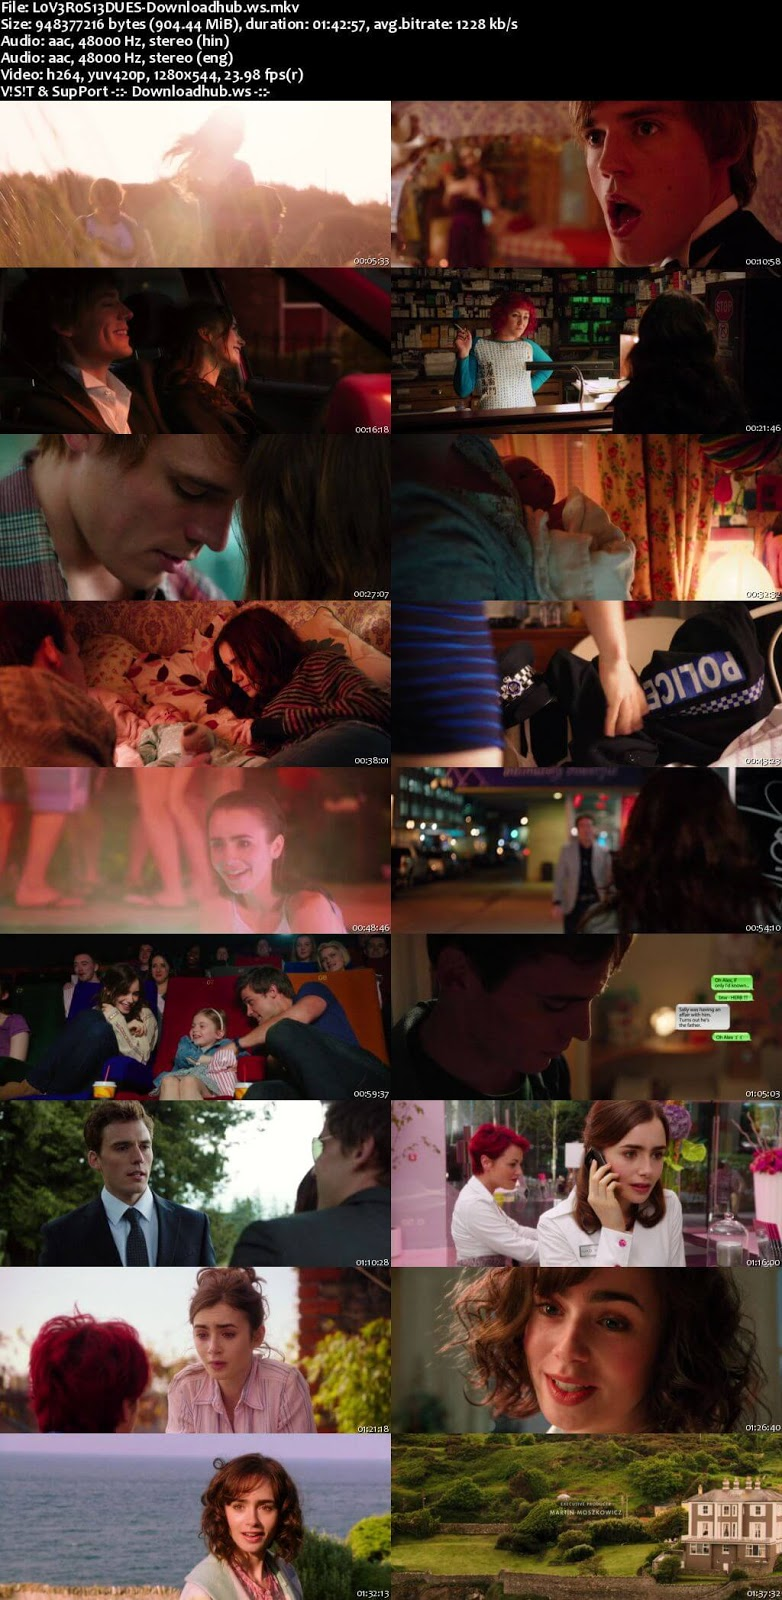 Love, Rosie 2014 Hindi Dual Audio 720p BluRay Free Download